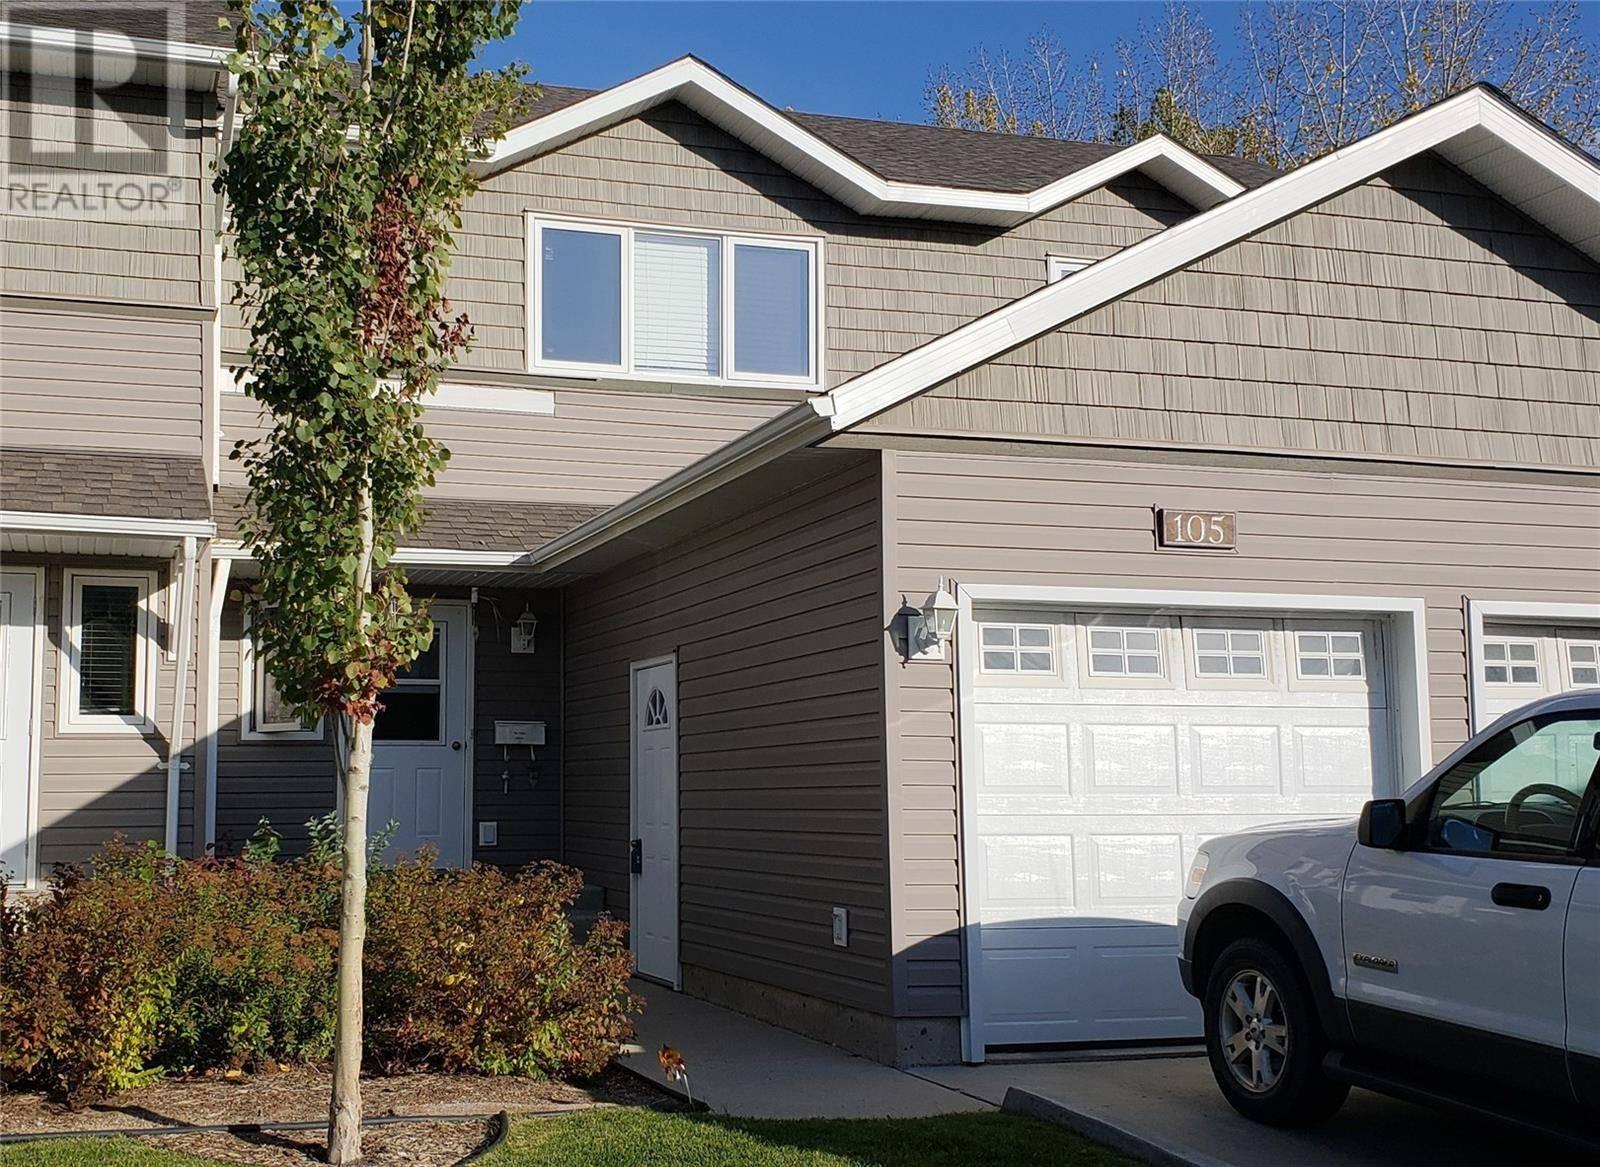 Townhouse for sale at 715 Hart Rd Unit 105 Saskatoon Saskatchewan - MLS: SK788474